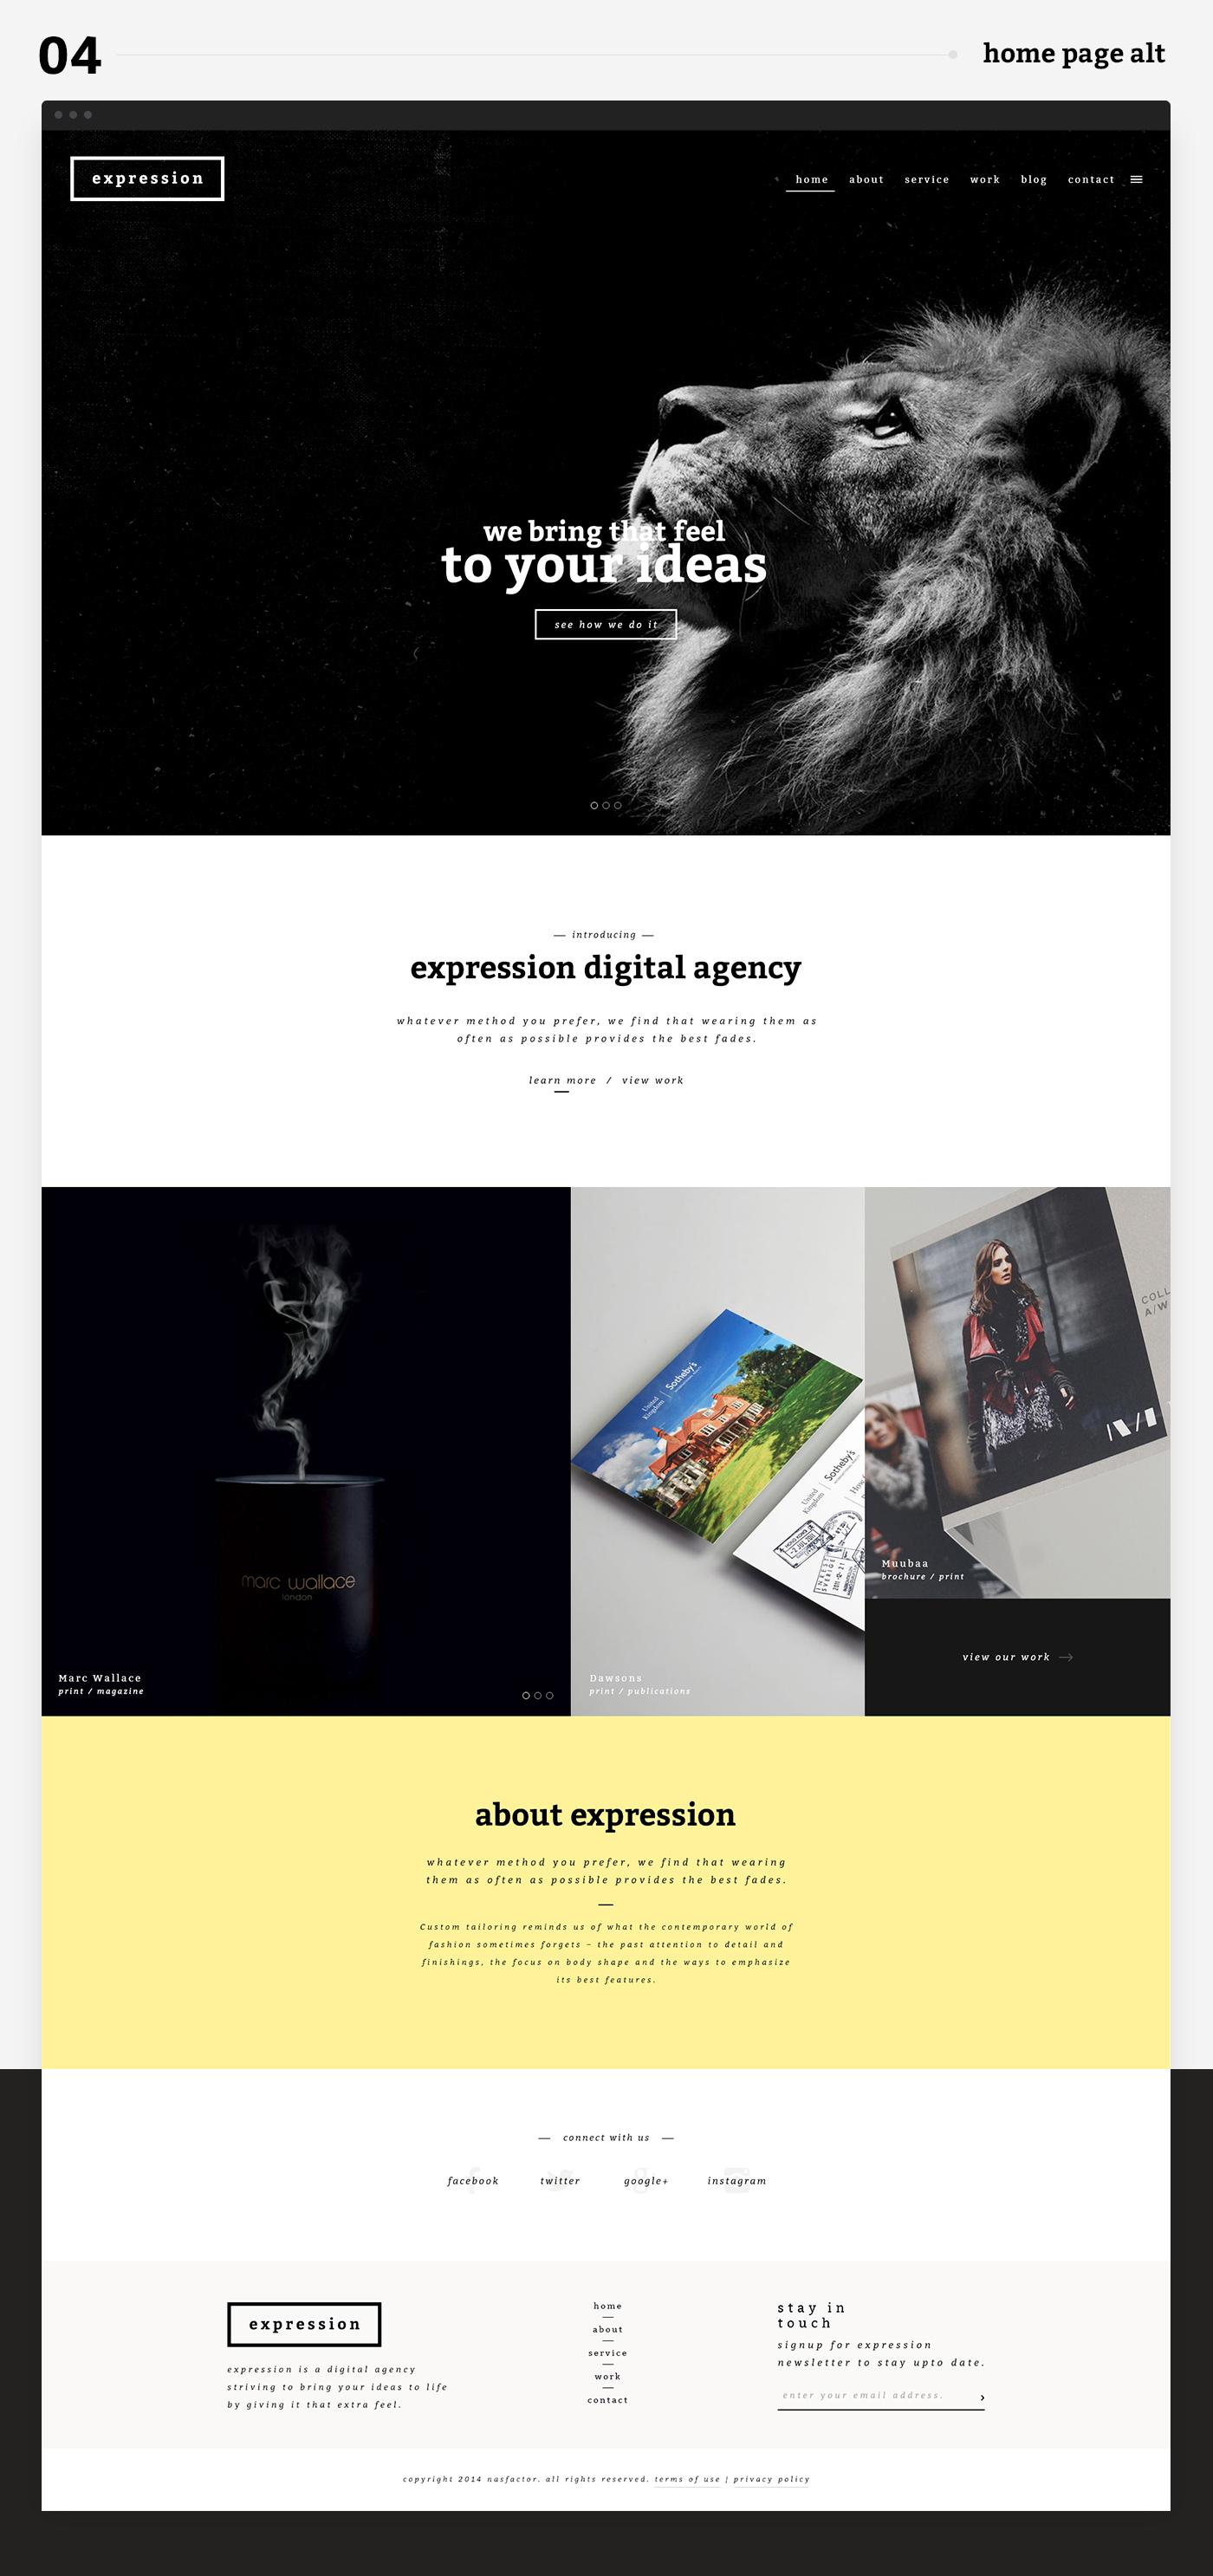 unity,pixelzeesh,UI,ux,interaction,interactive,Web,agency,creative